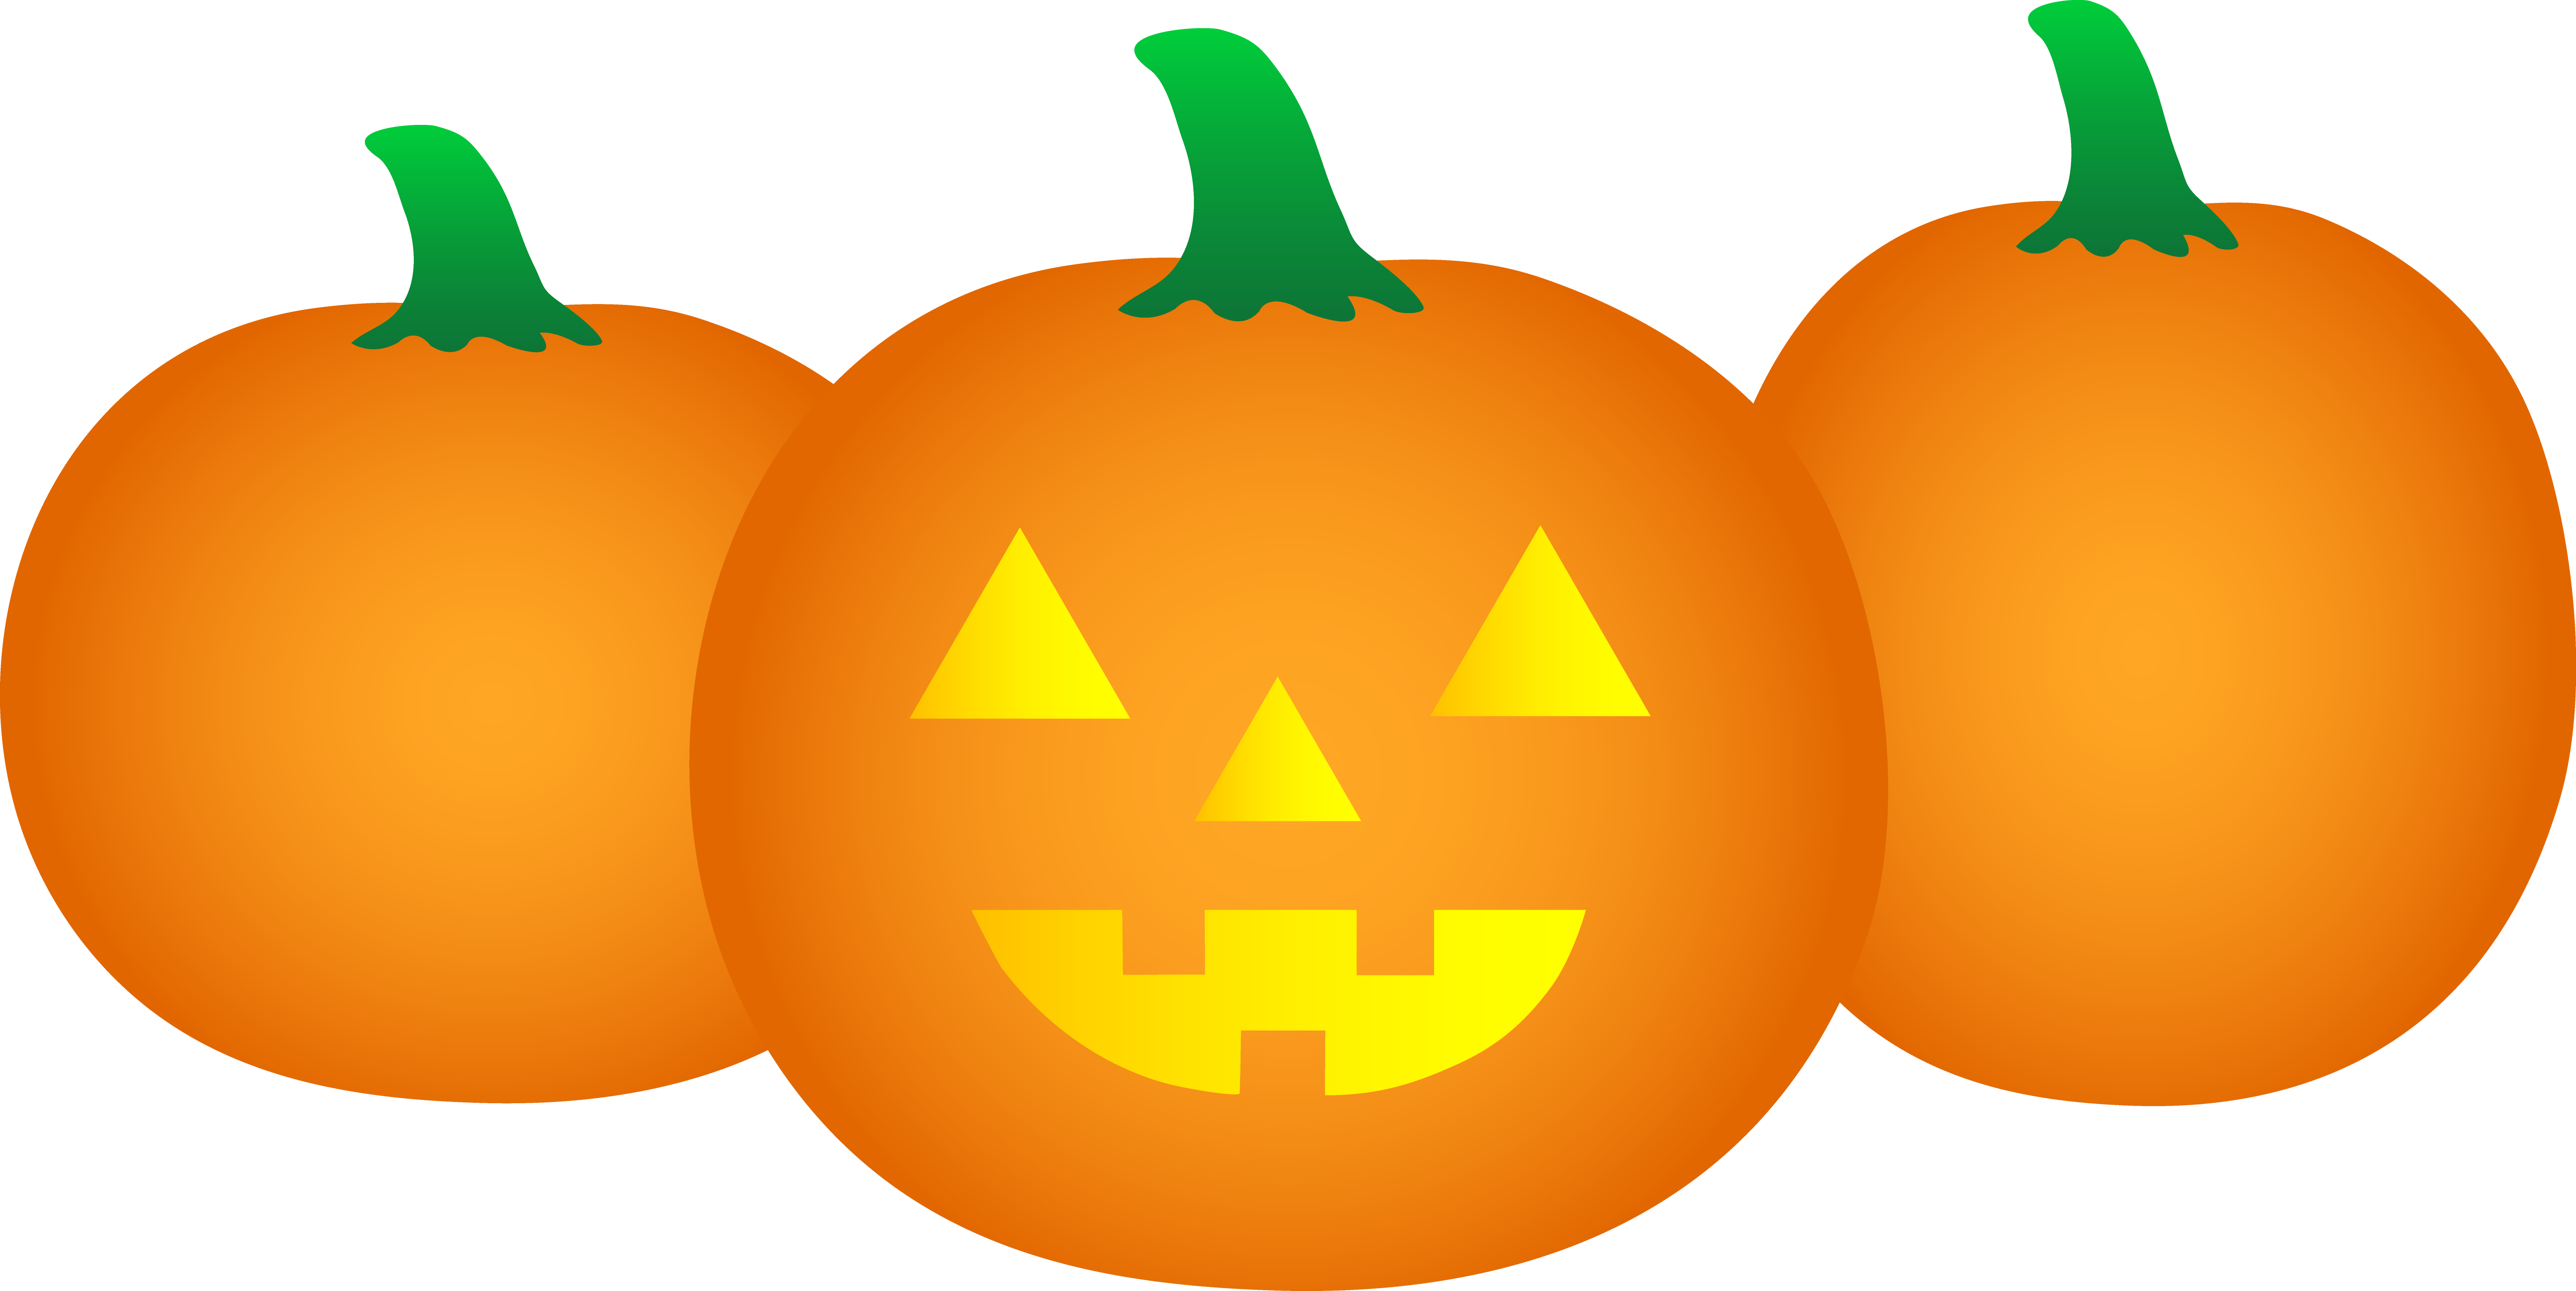 Free Halloween Pumpkin Clipart, Download Free Clip Art, Free.